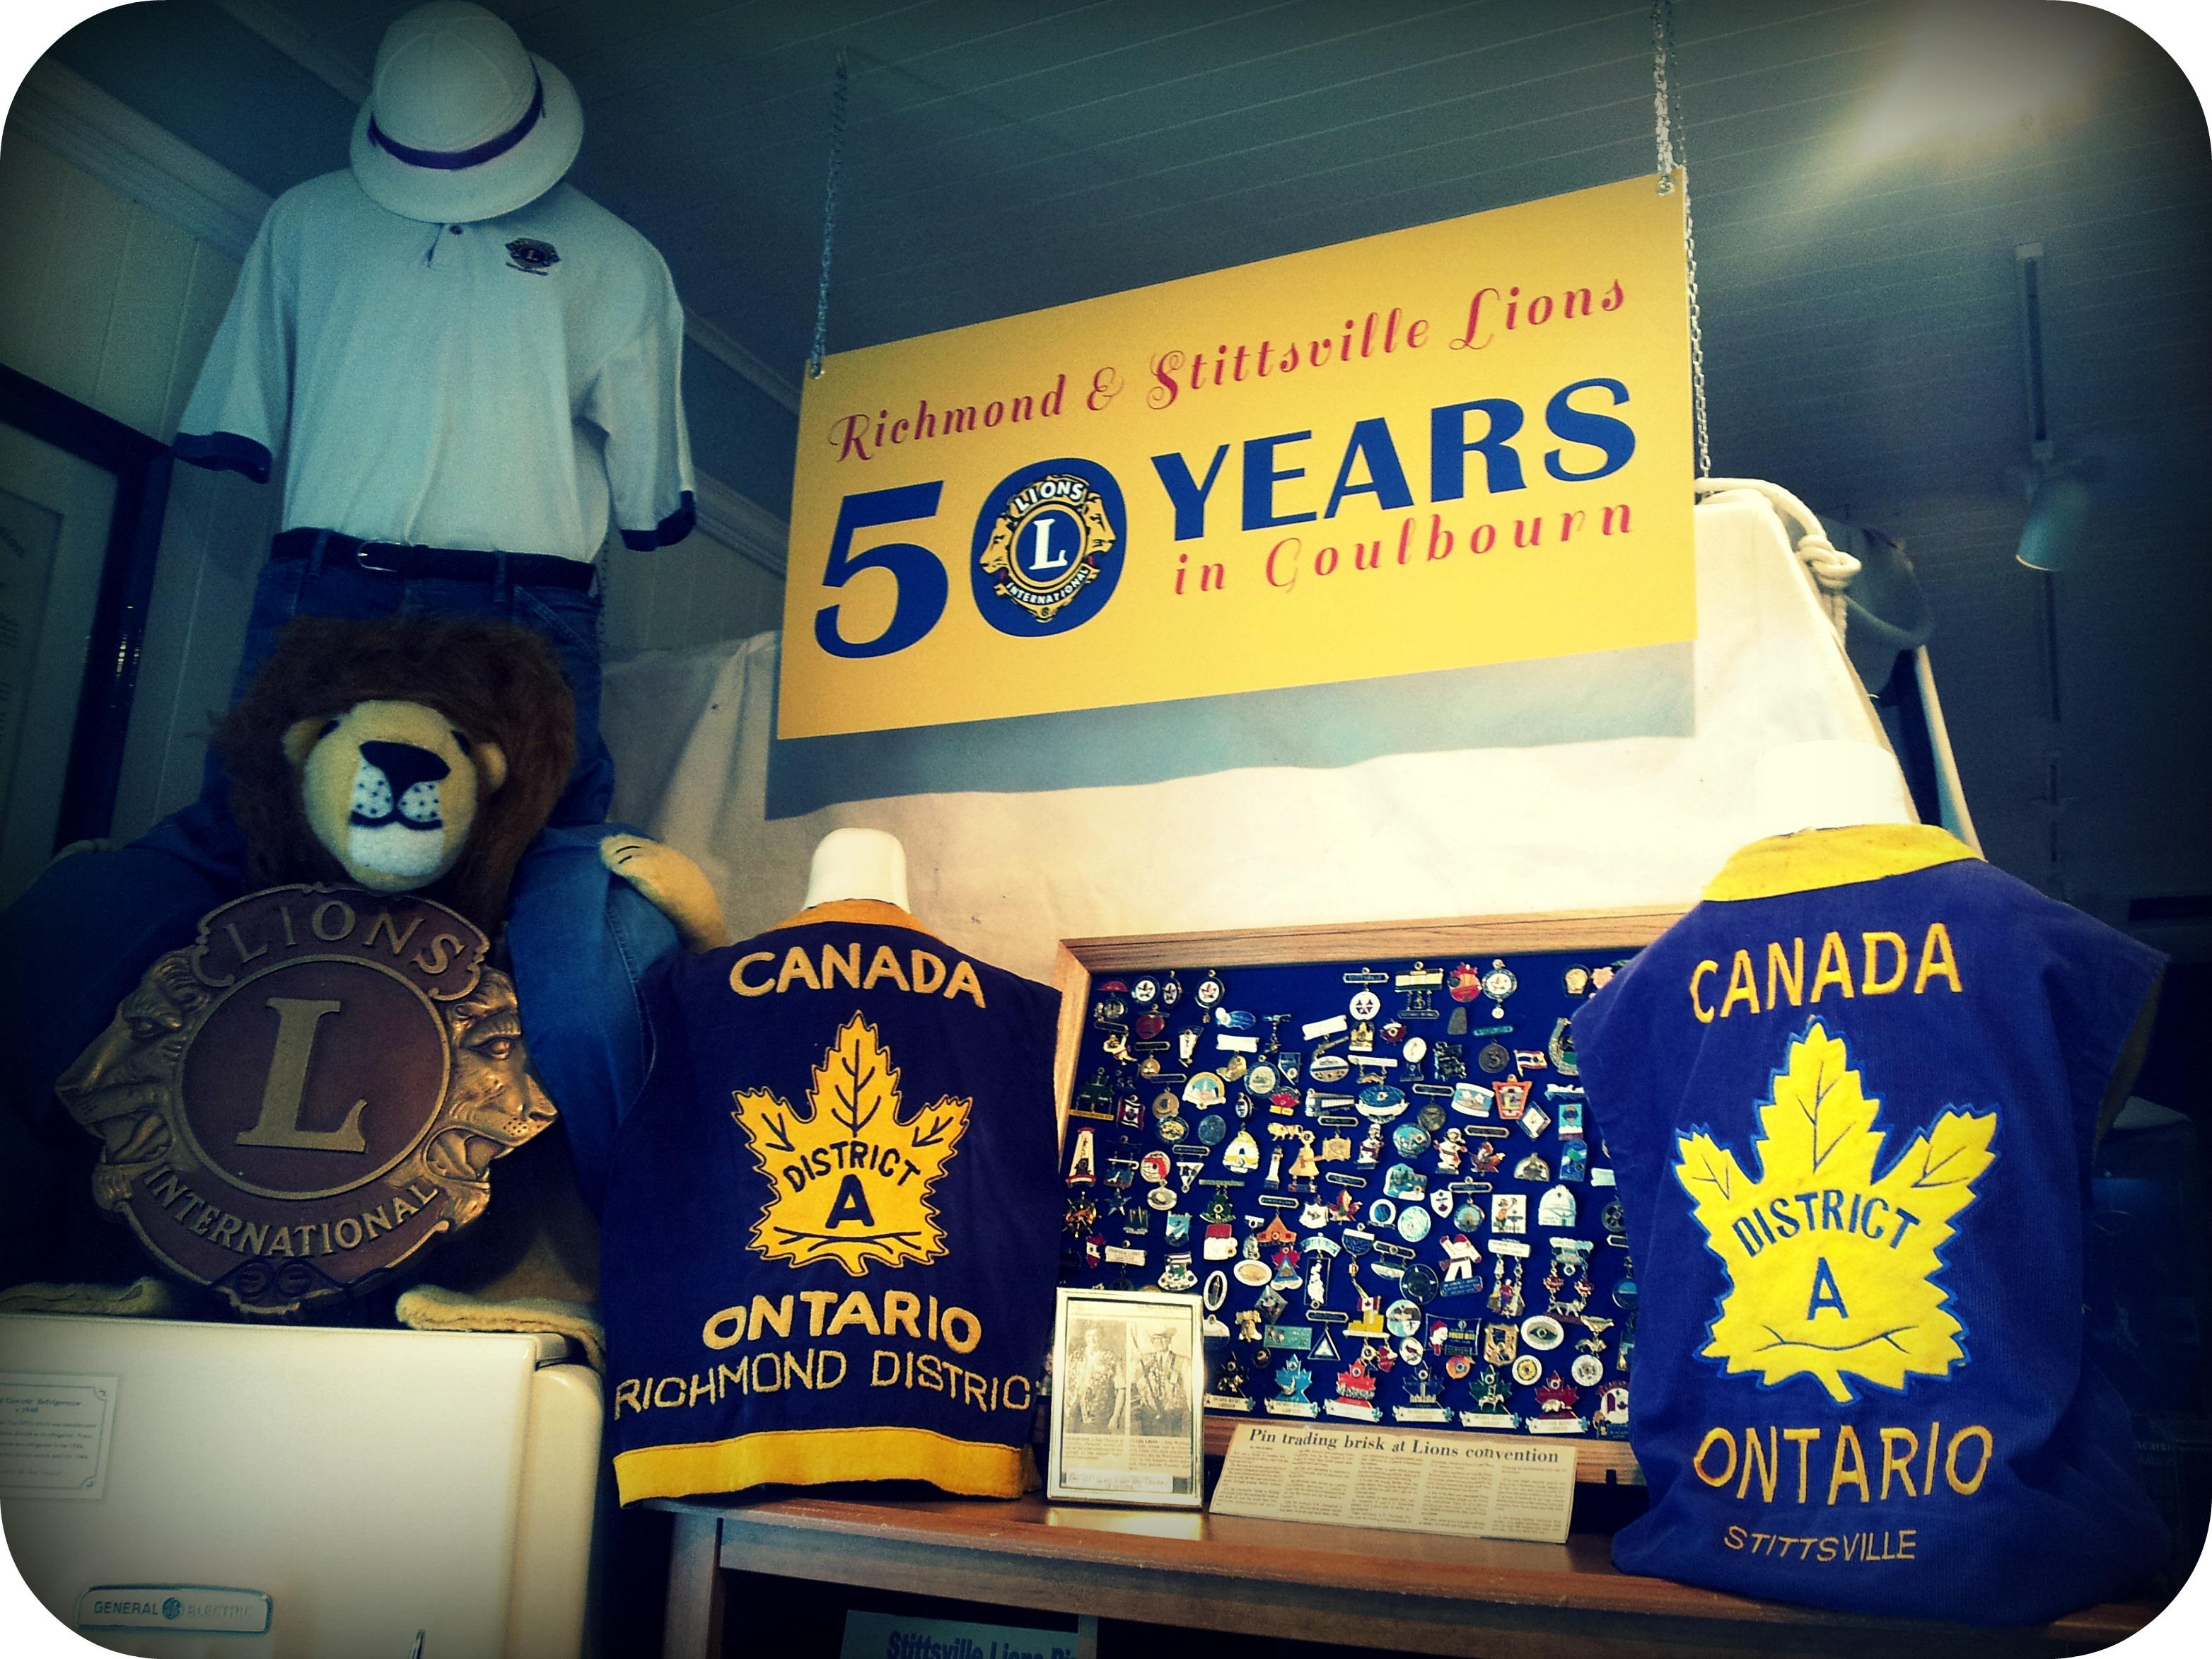 Lions 50 Years memorabilia